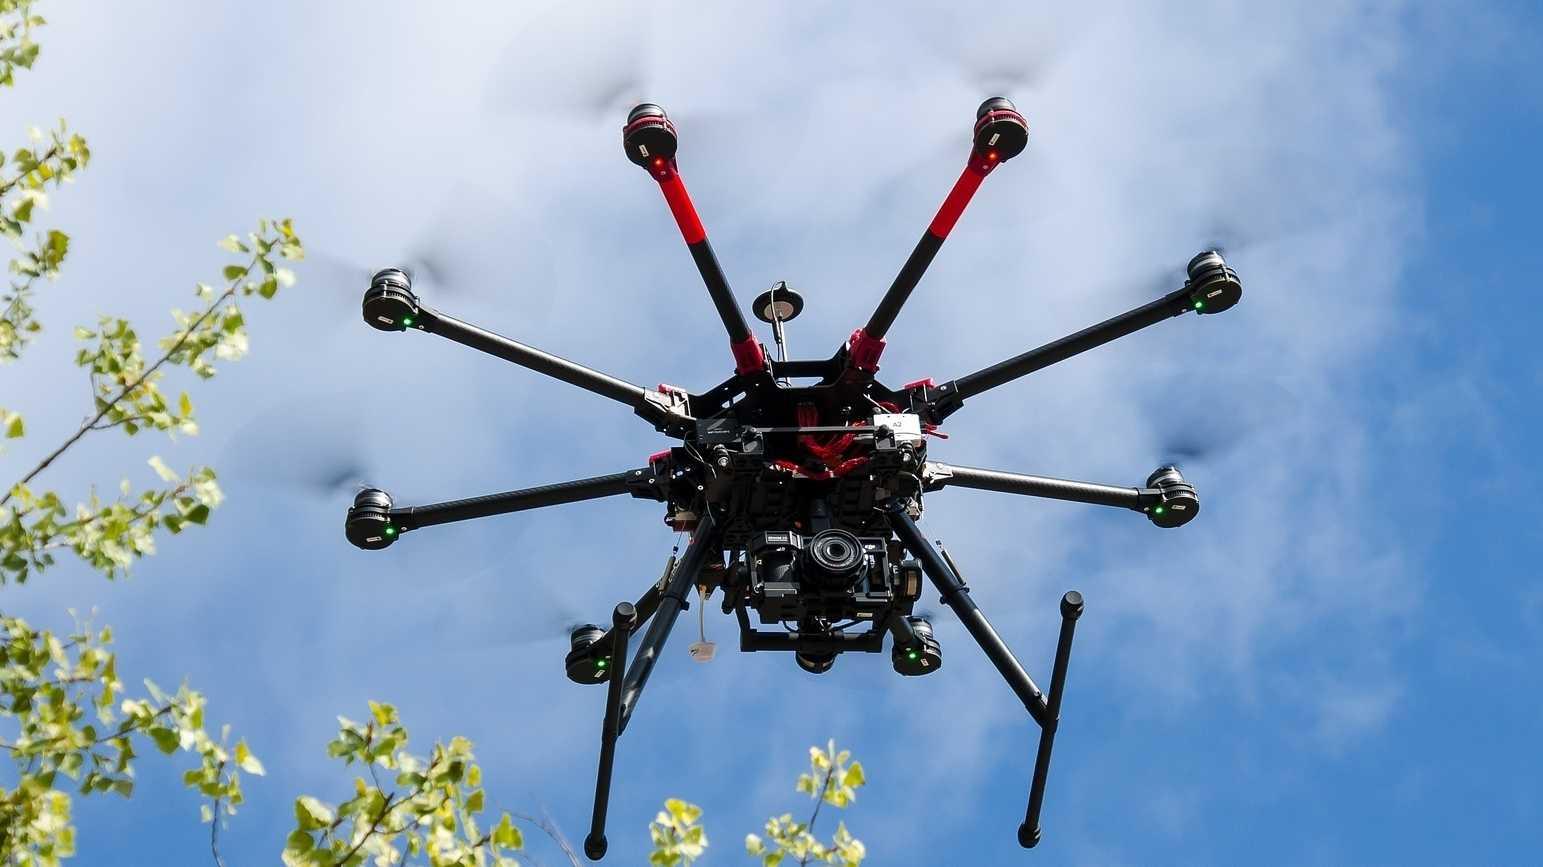 Grenzüberwachung: Roboterforscher warnt vor EU-Drohnenprojekt Roborder